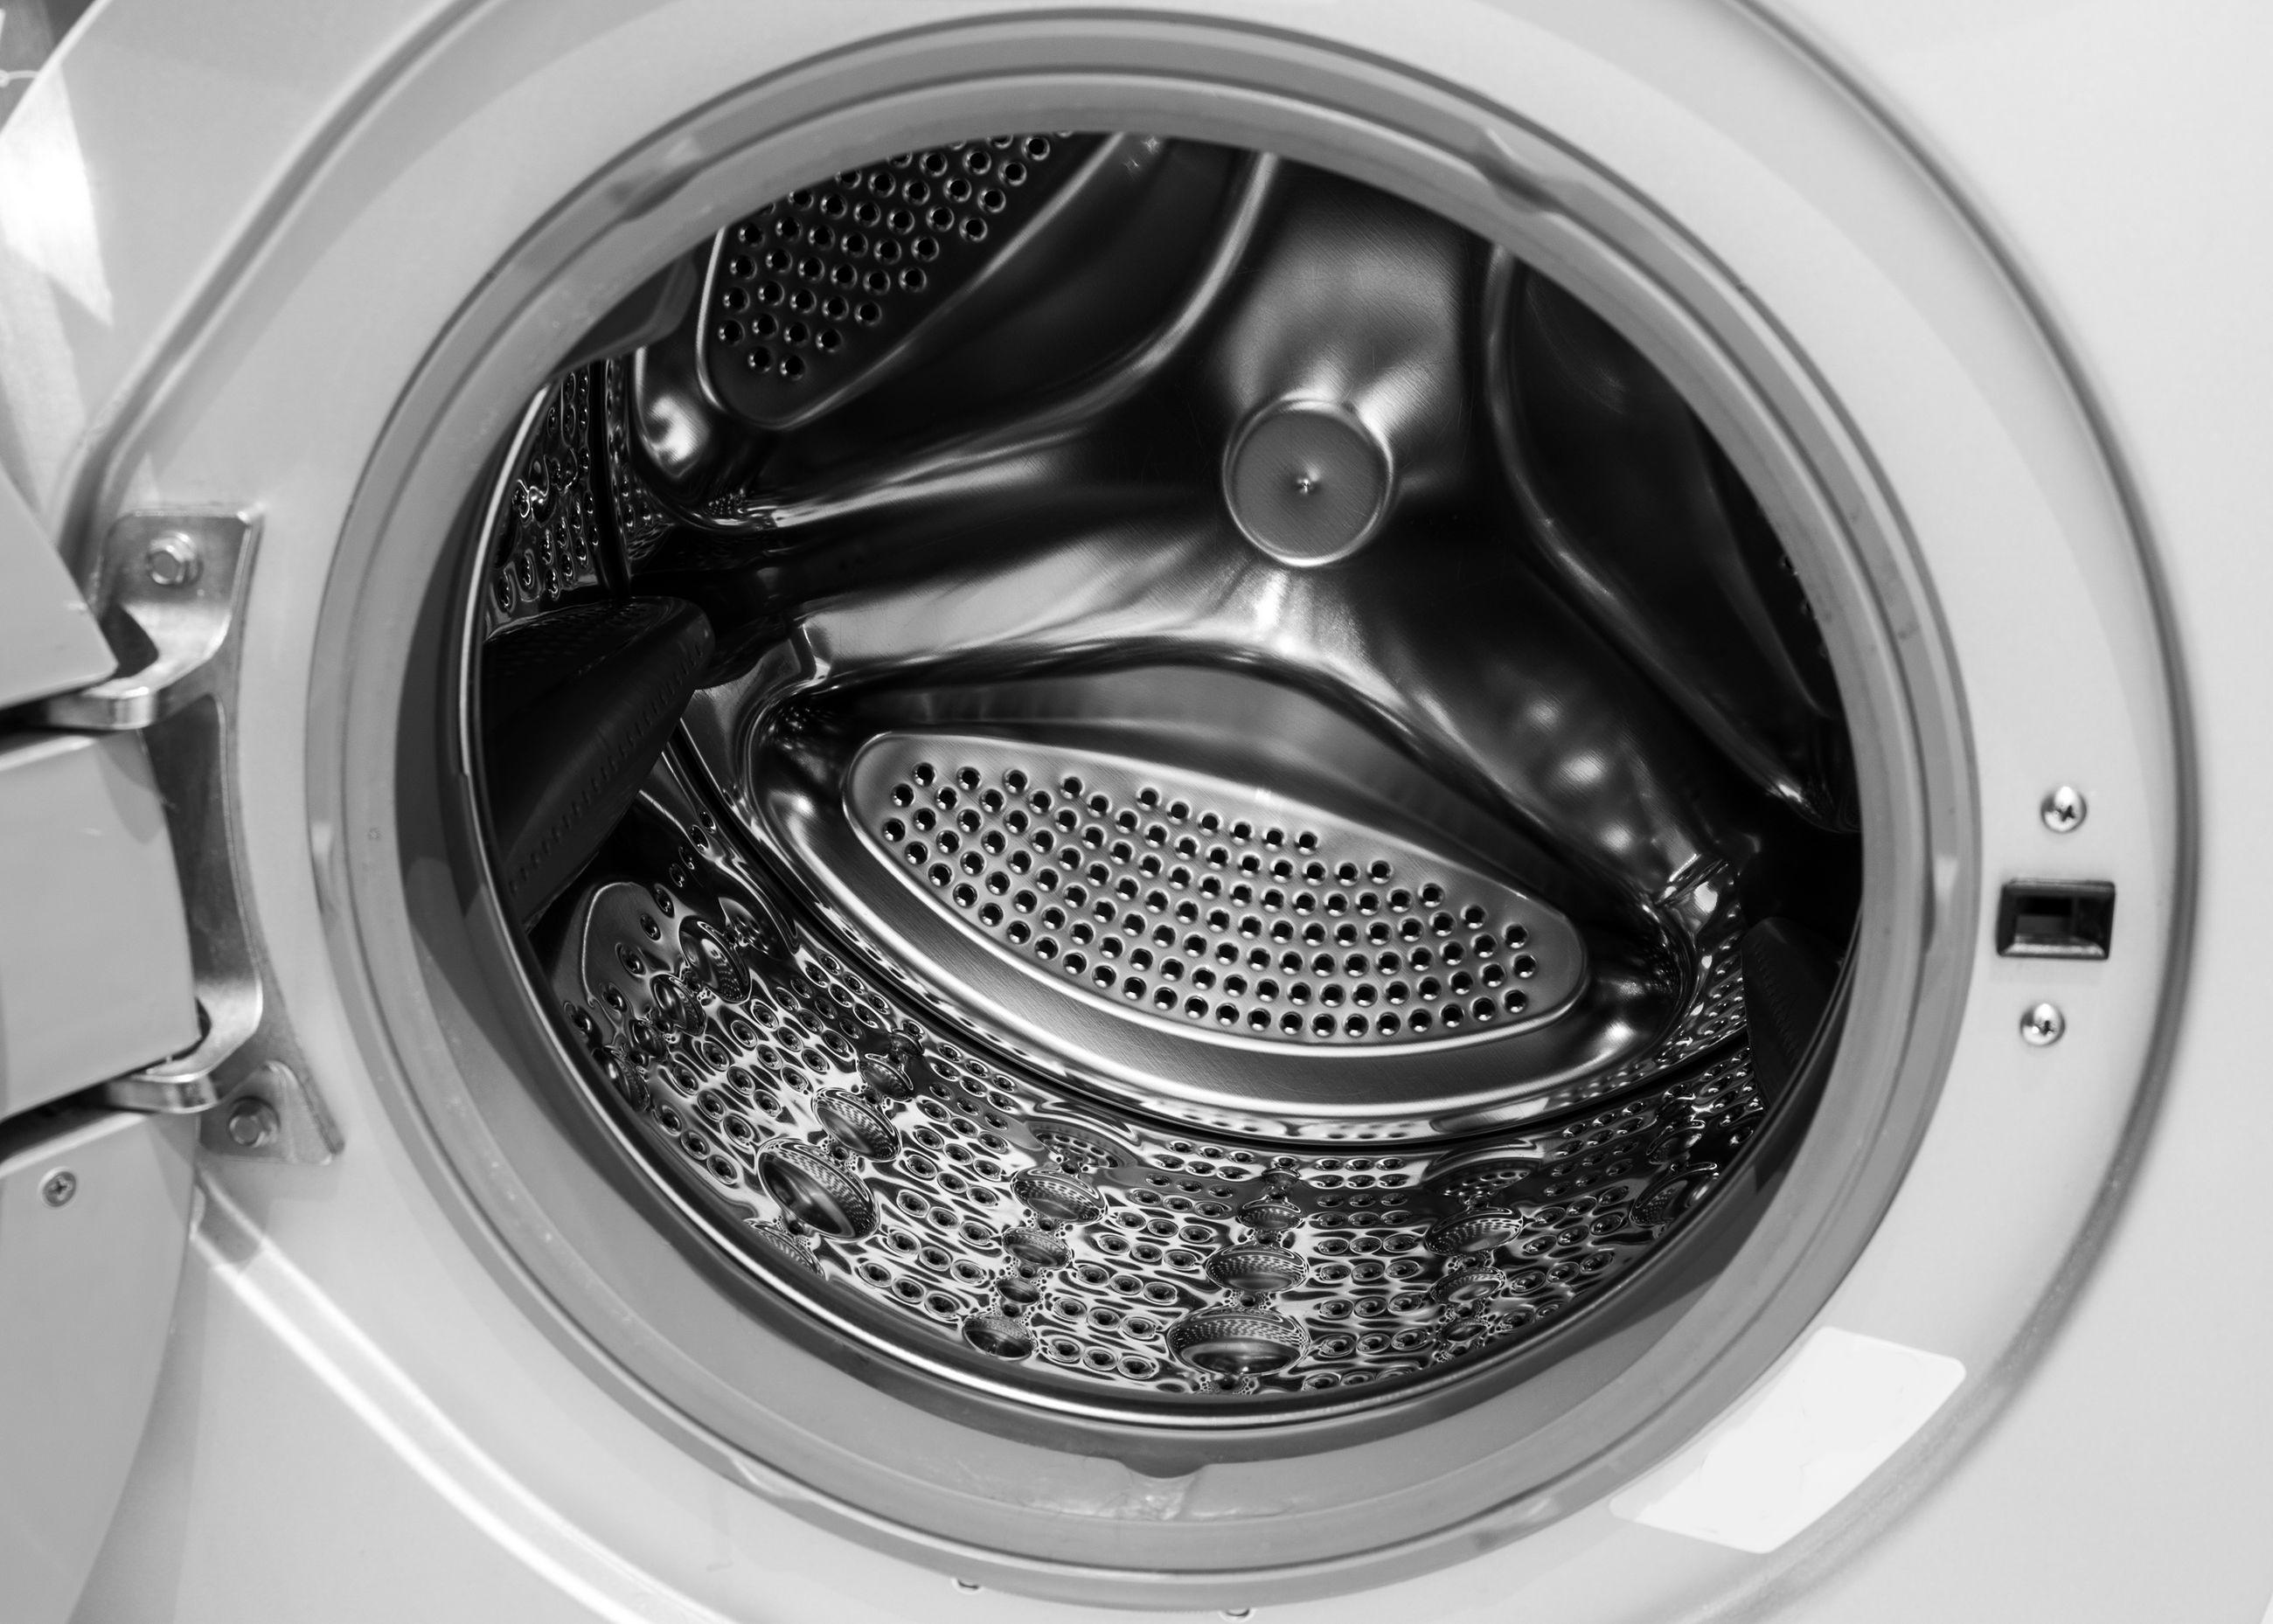 Directly above shot of washing machine